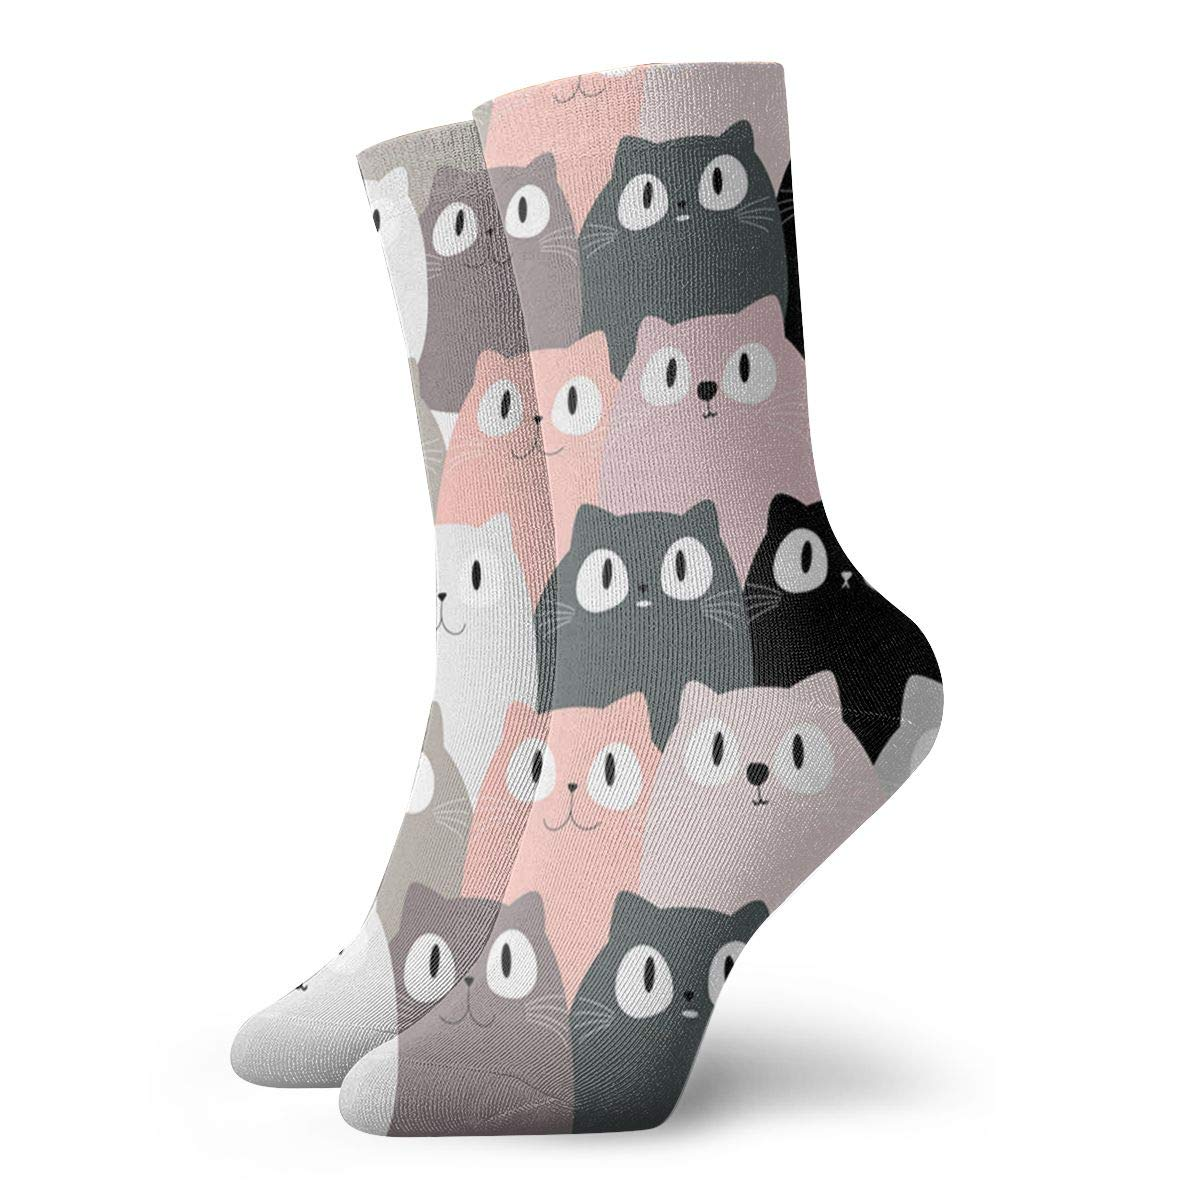 Cute-pink-cat Unisex Funny Casual Crew Socks Athletic Socks For Boys Girls Kids Teenagers